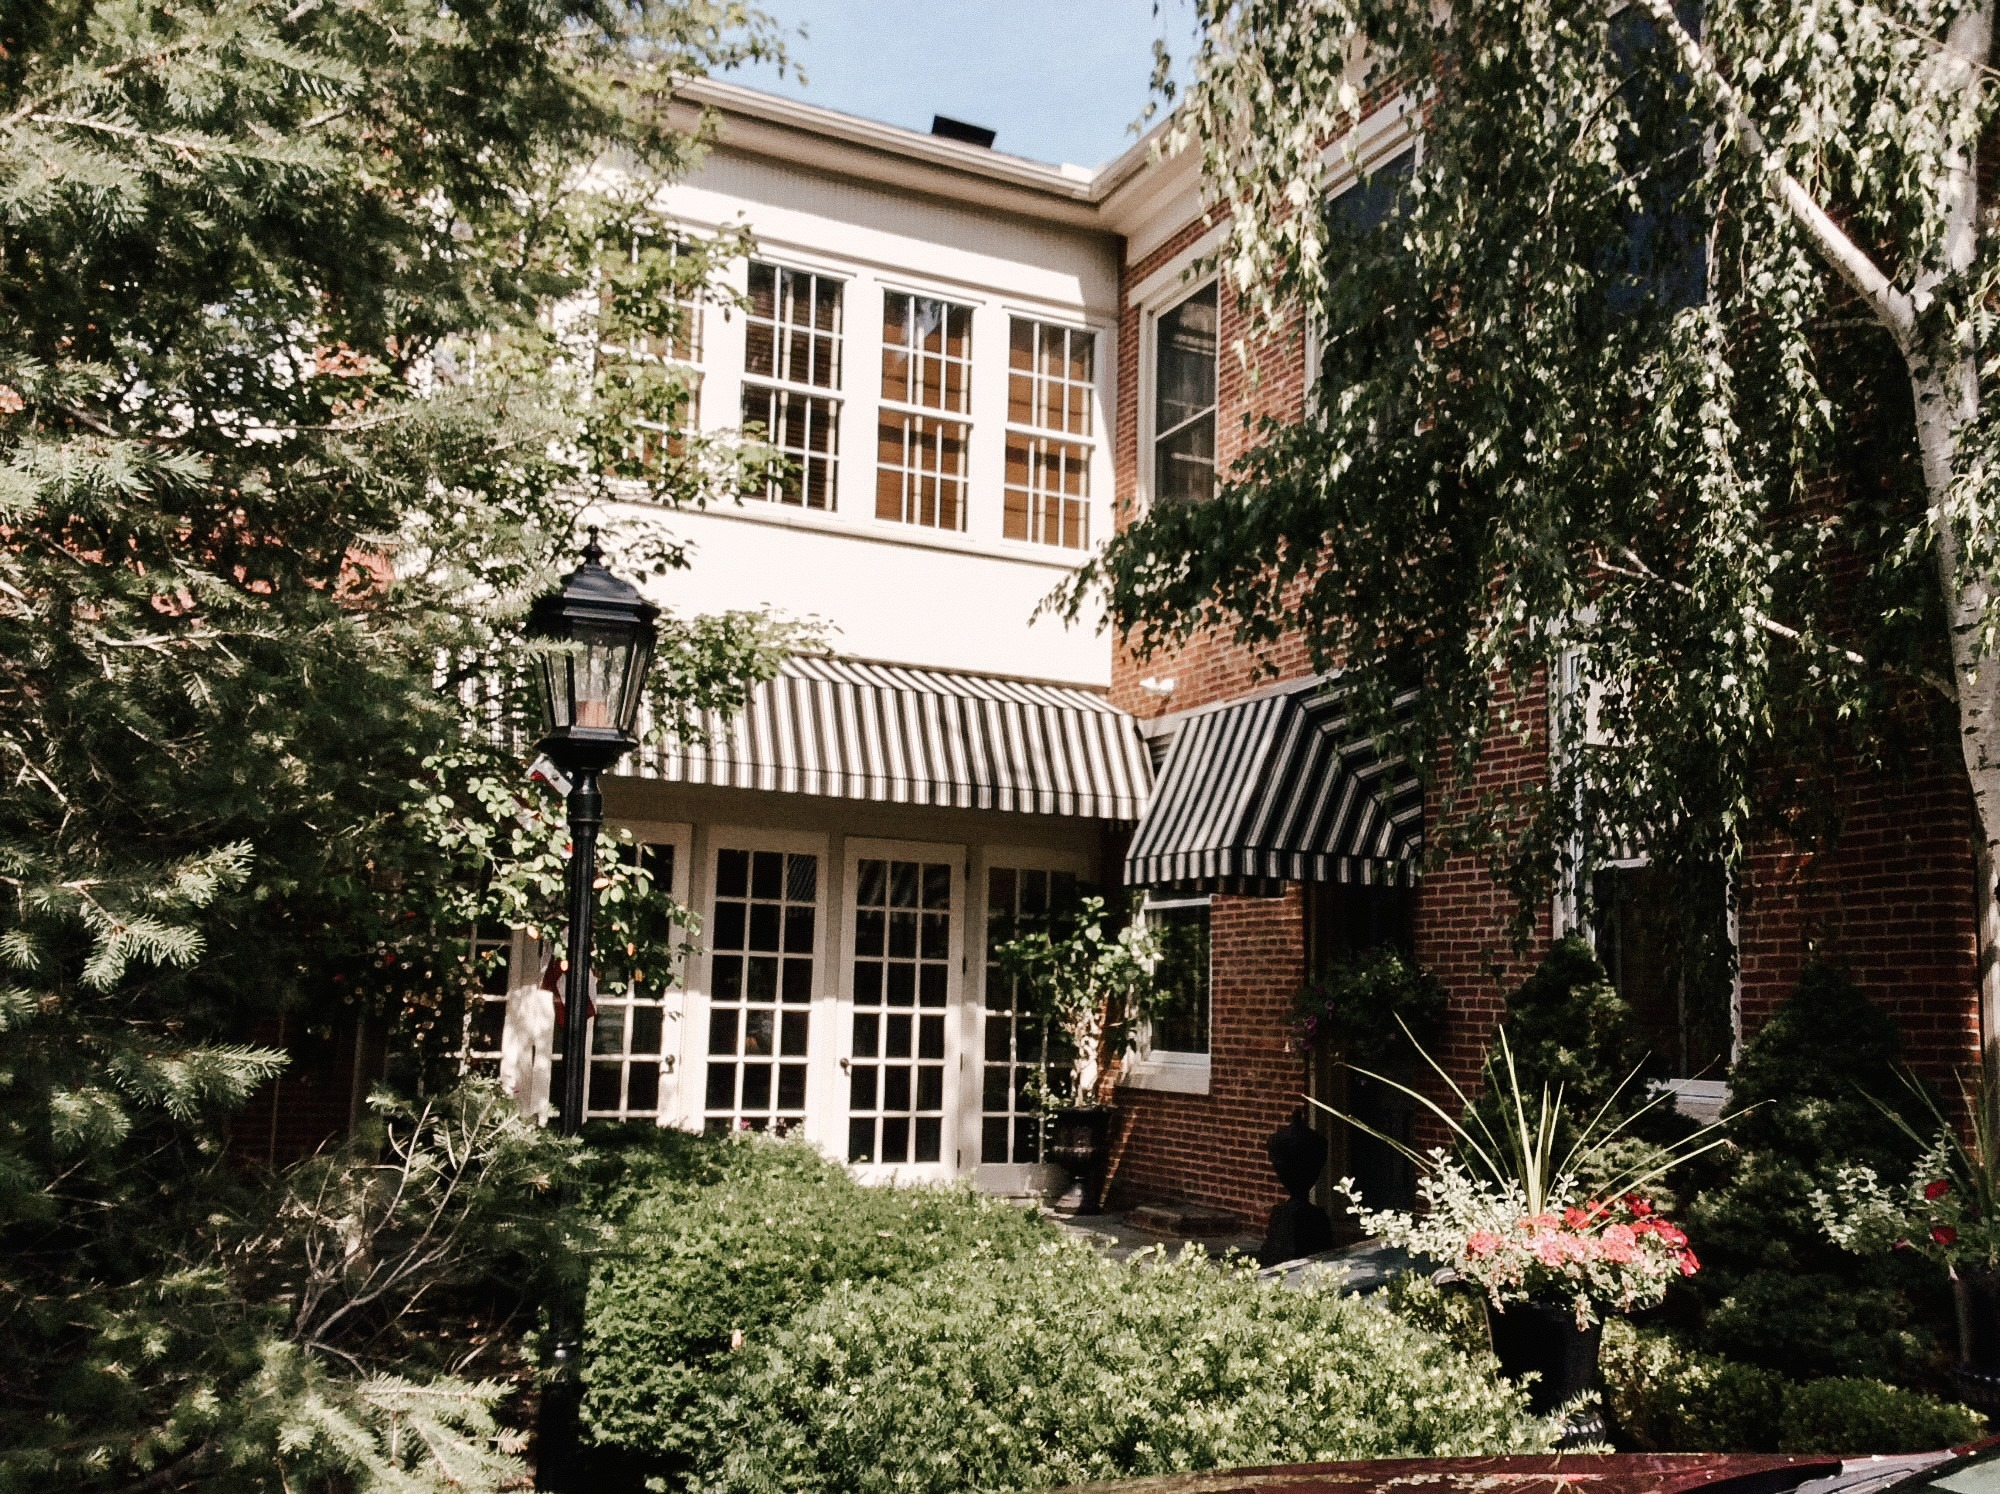 Londonderry Inn - Exterior